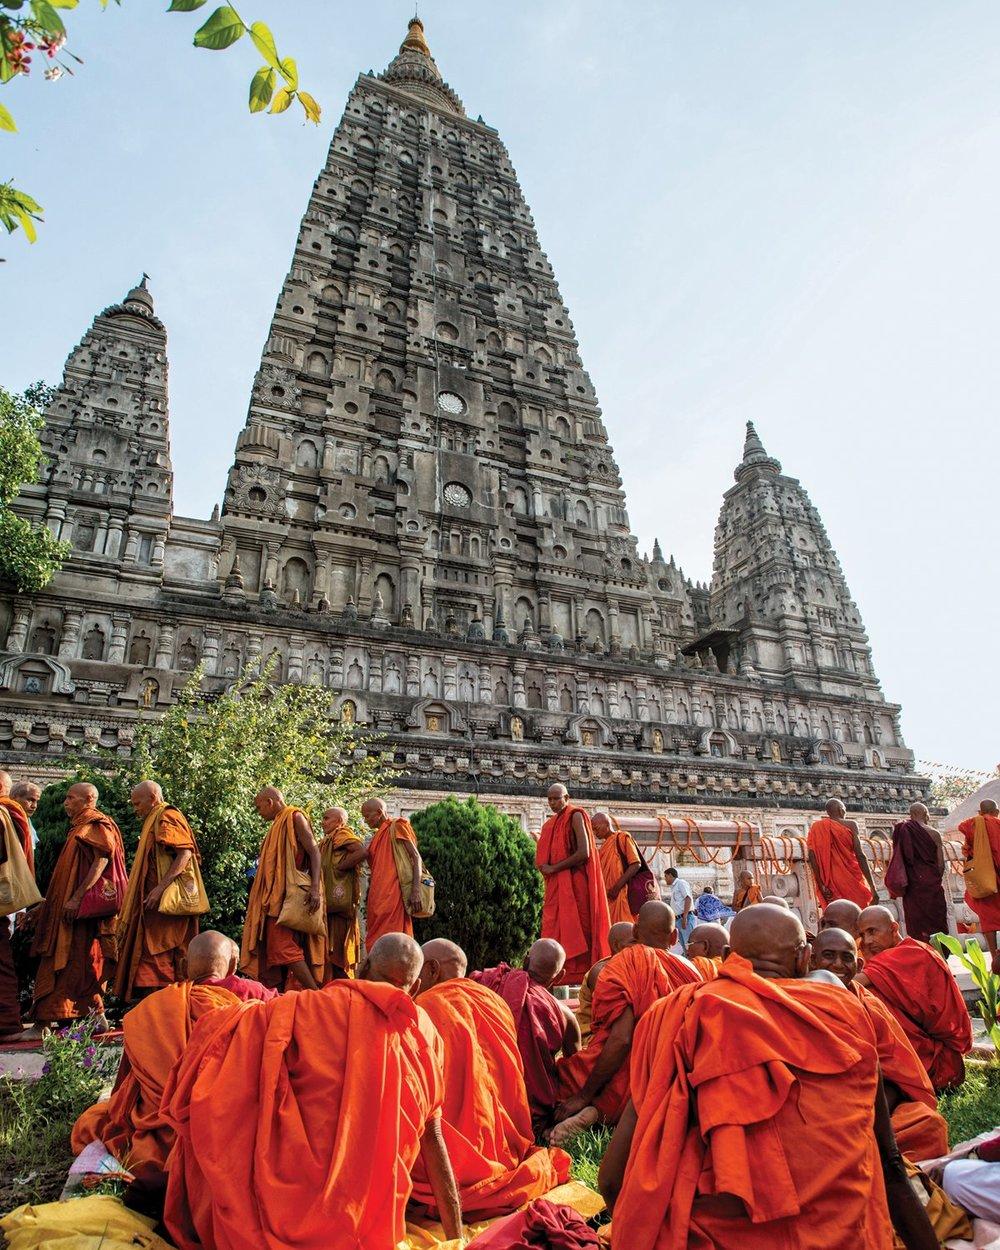 Buddhist monks amass beside Bodh Gaya's Mahabodhi Temple, a UNESCO World Heritage site. Photo by PRABUDDHARAY/GETTY IMAGES